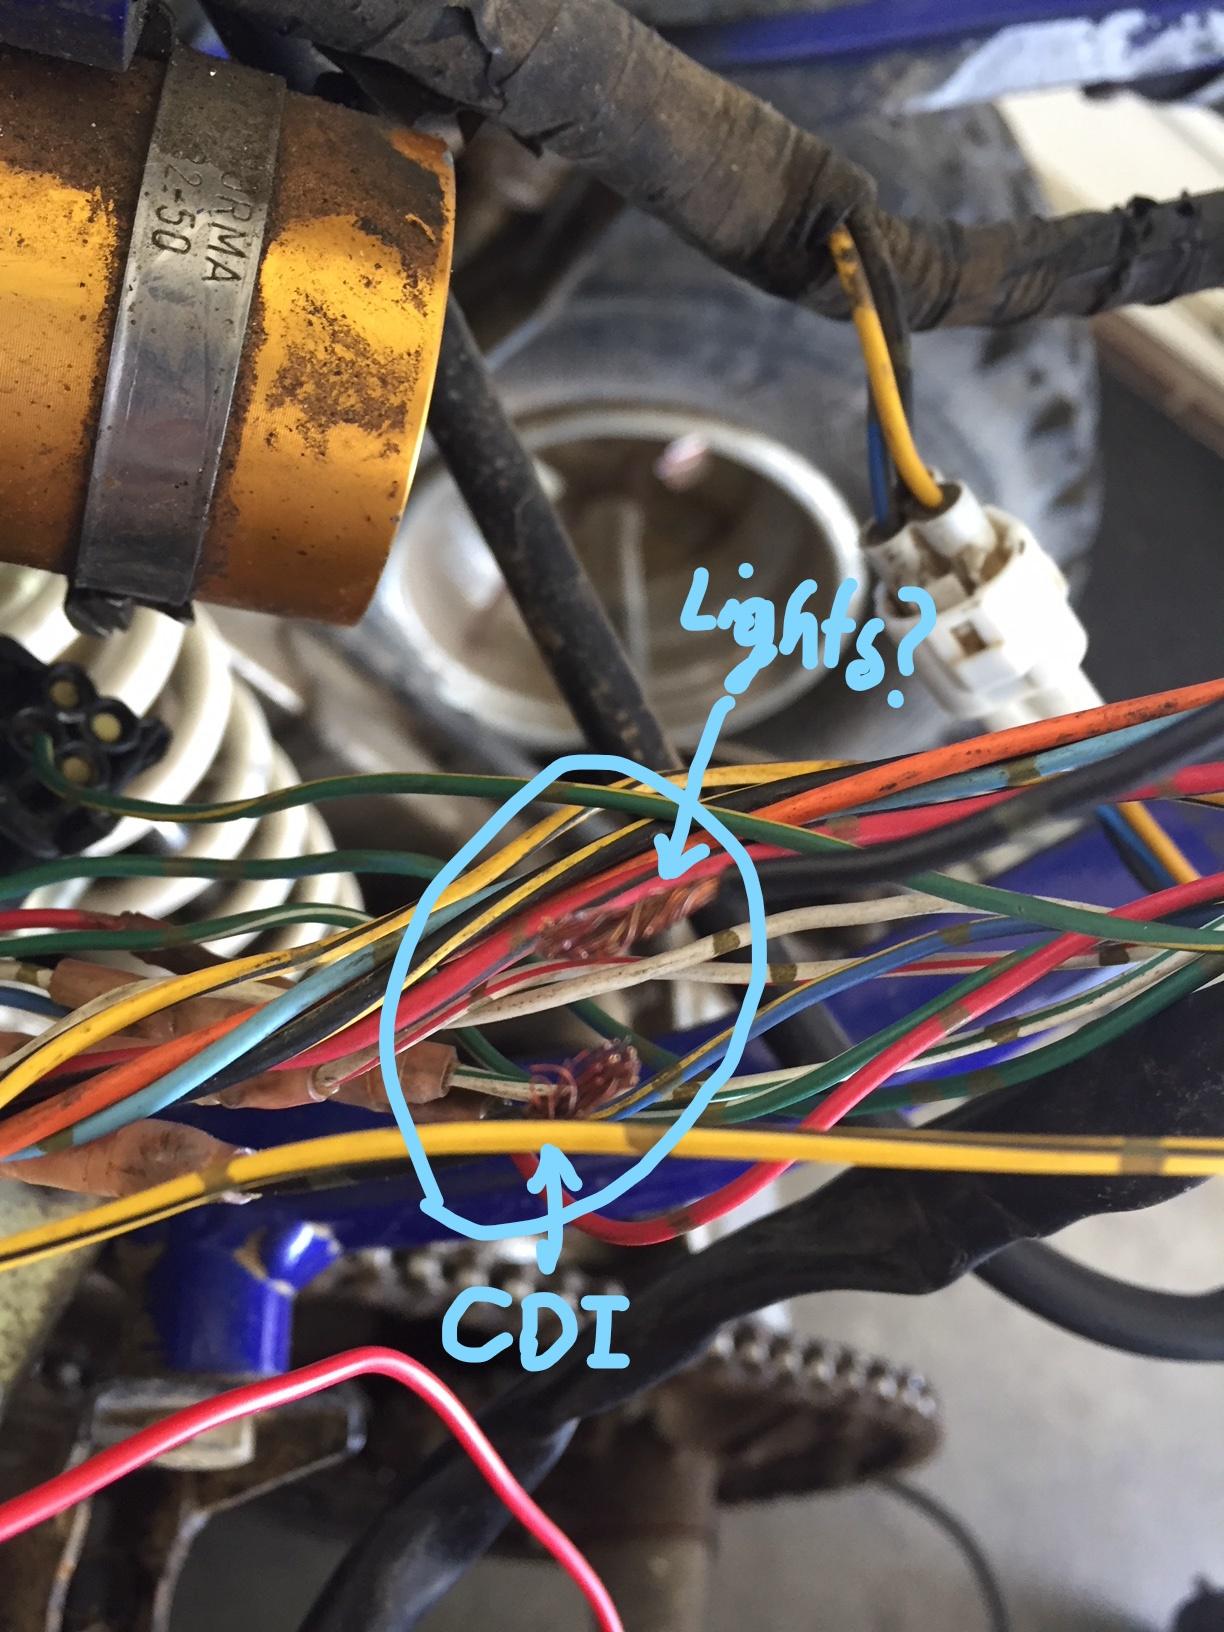 4530d1530985862-2001-raptor-660-no-spark-inkedwiring-short_li Raptor Spark Wiring Diagram on pipes for, swing arm, yamaha yfm, top speed, yamaha quad, mud tires, custom yamaha,